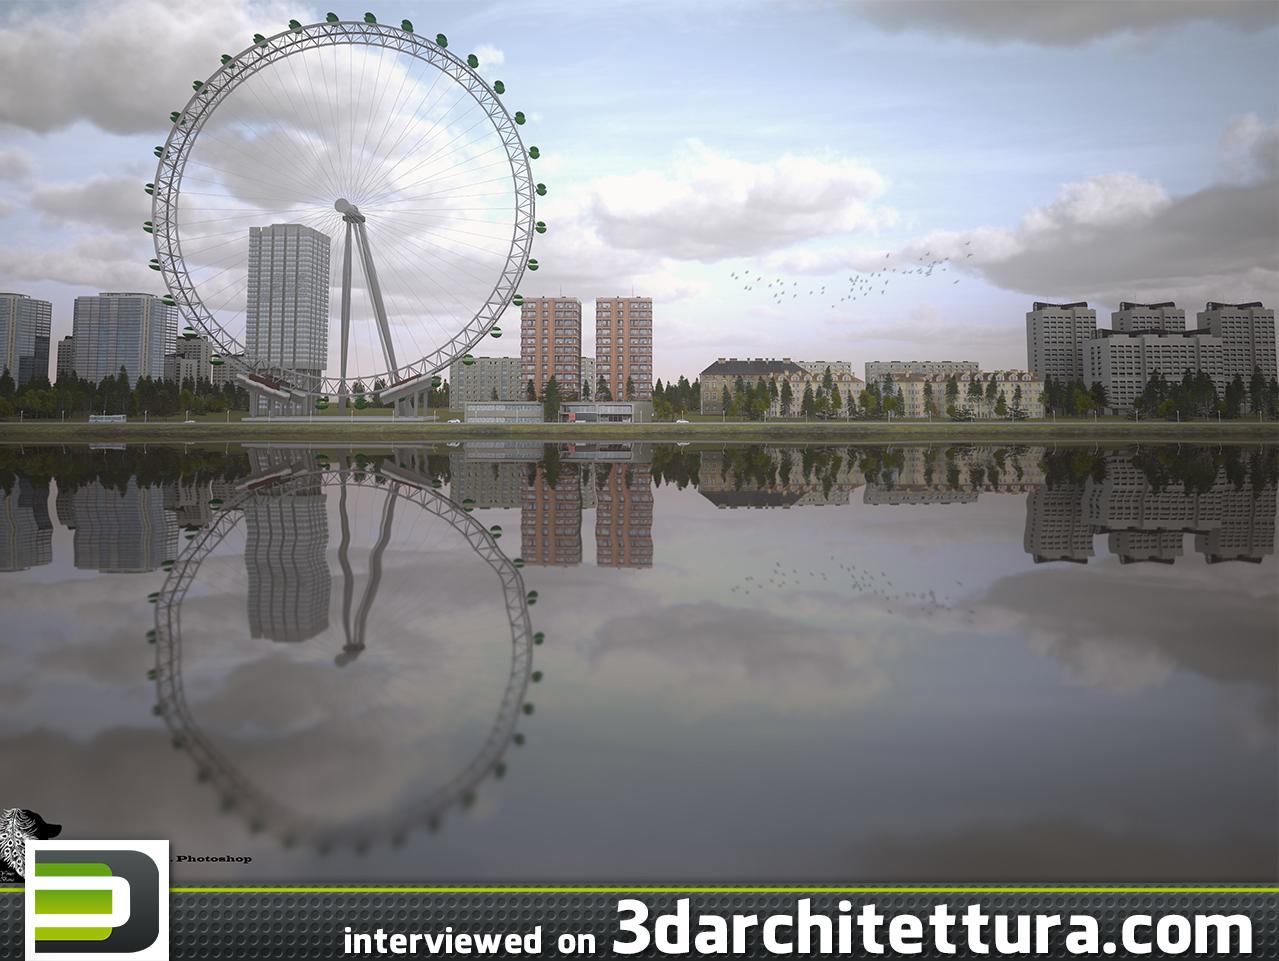 Yones Bana interiewed for 3darchiitettura: render, 3d, CG, design, architecture